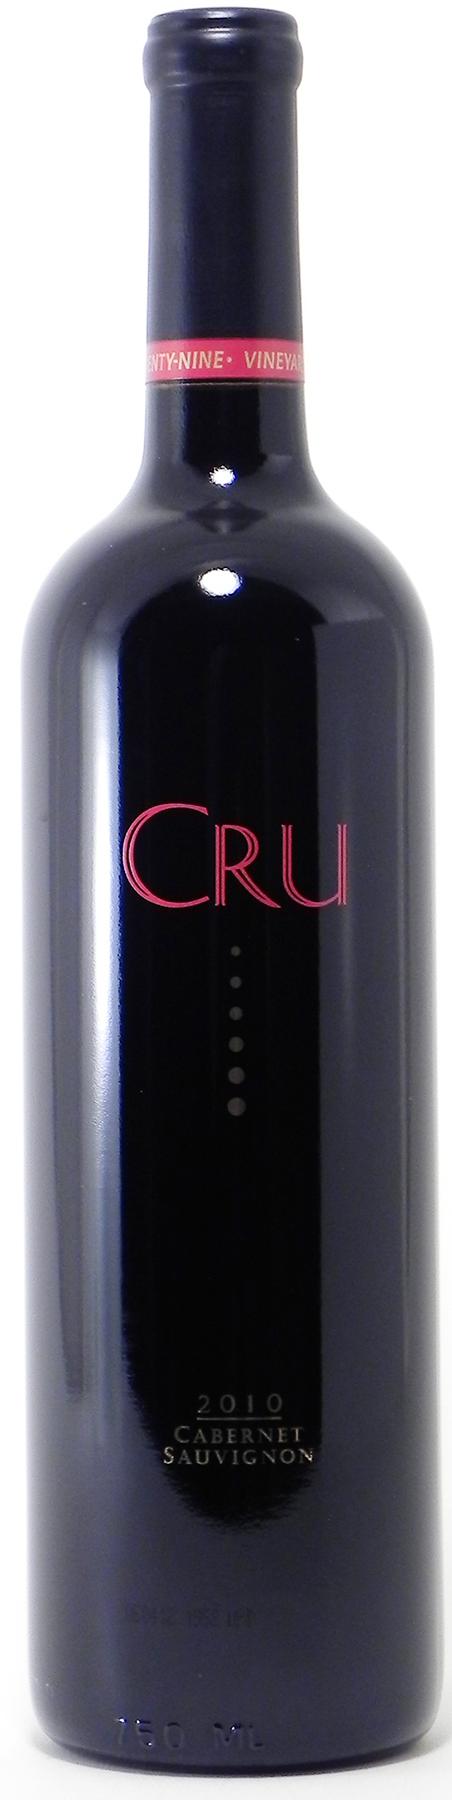 "2010 Vineyard 29 ""Cru"" Cabernet Sauvignon"